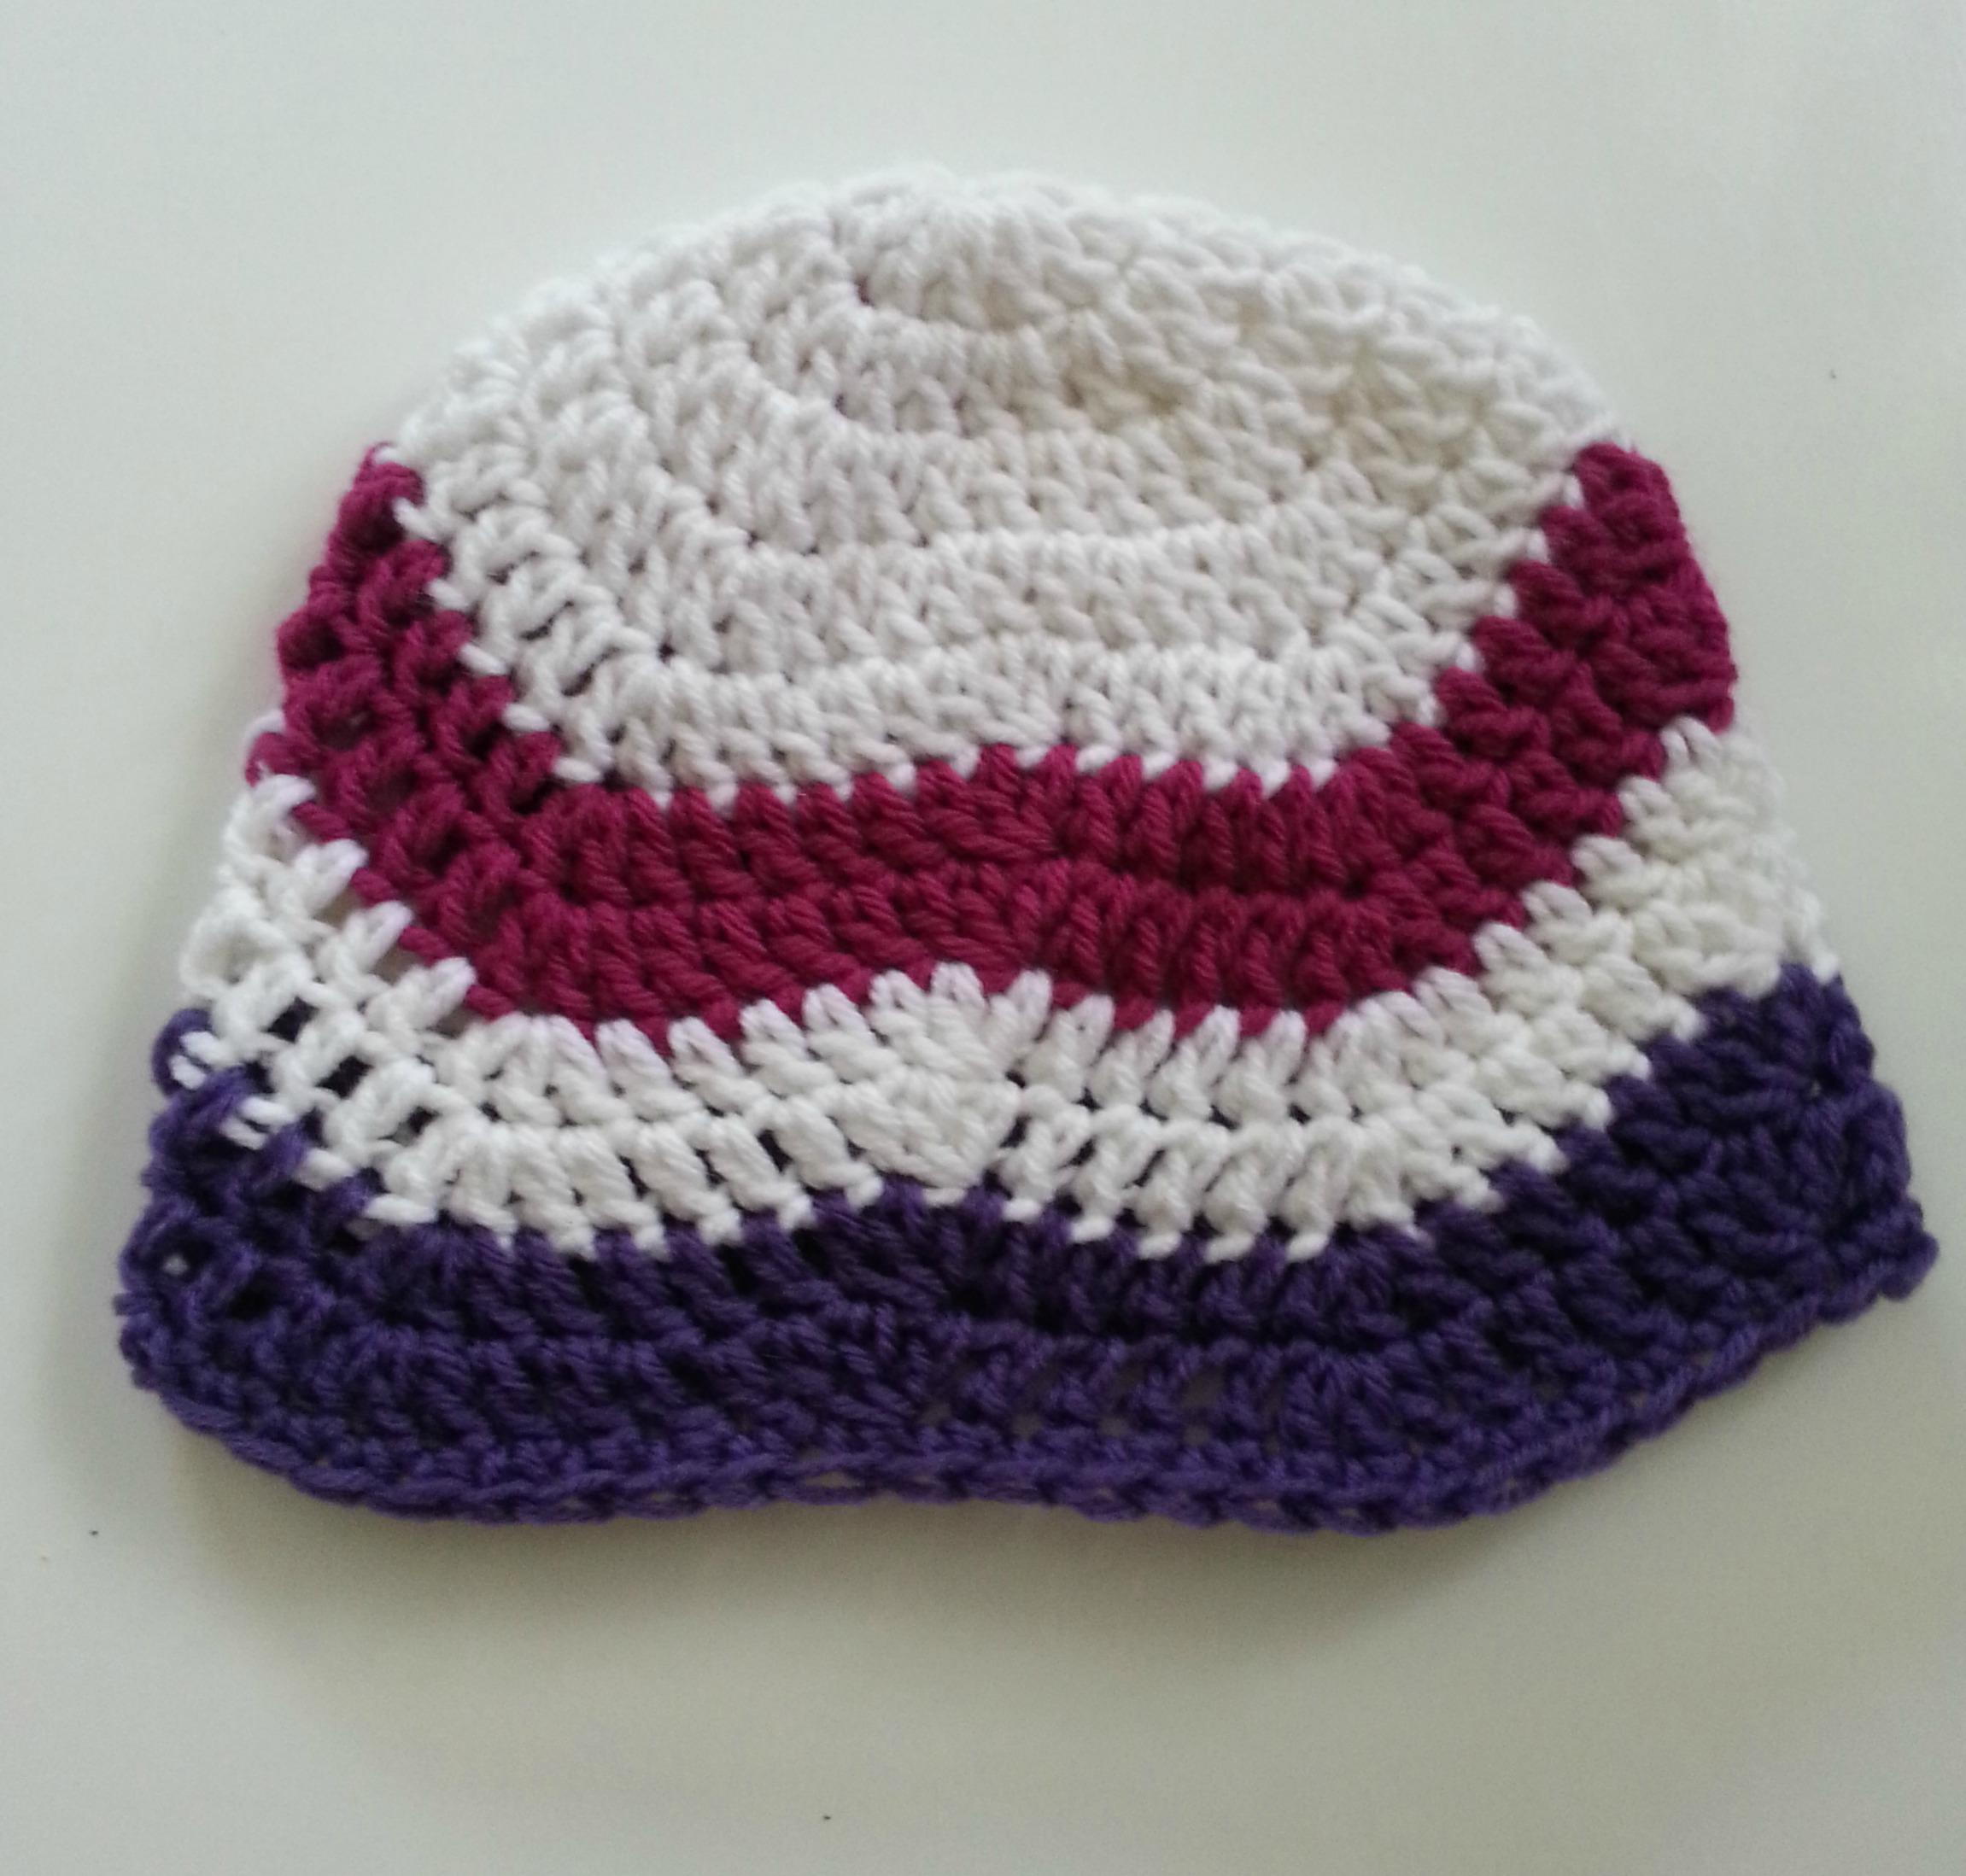 Chevron beanie easy crochet pattern tutorial rainbow warrior ccb2 bankloansurffo Image collections